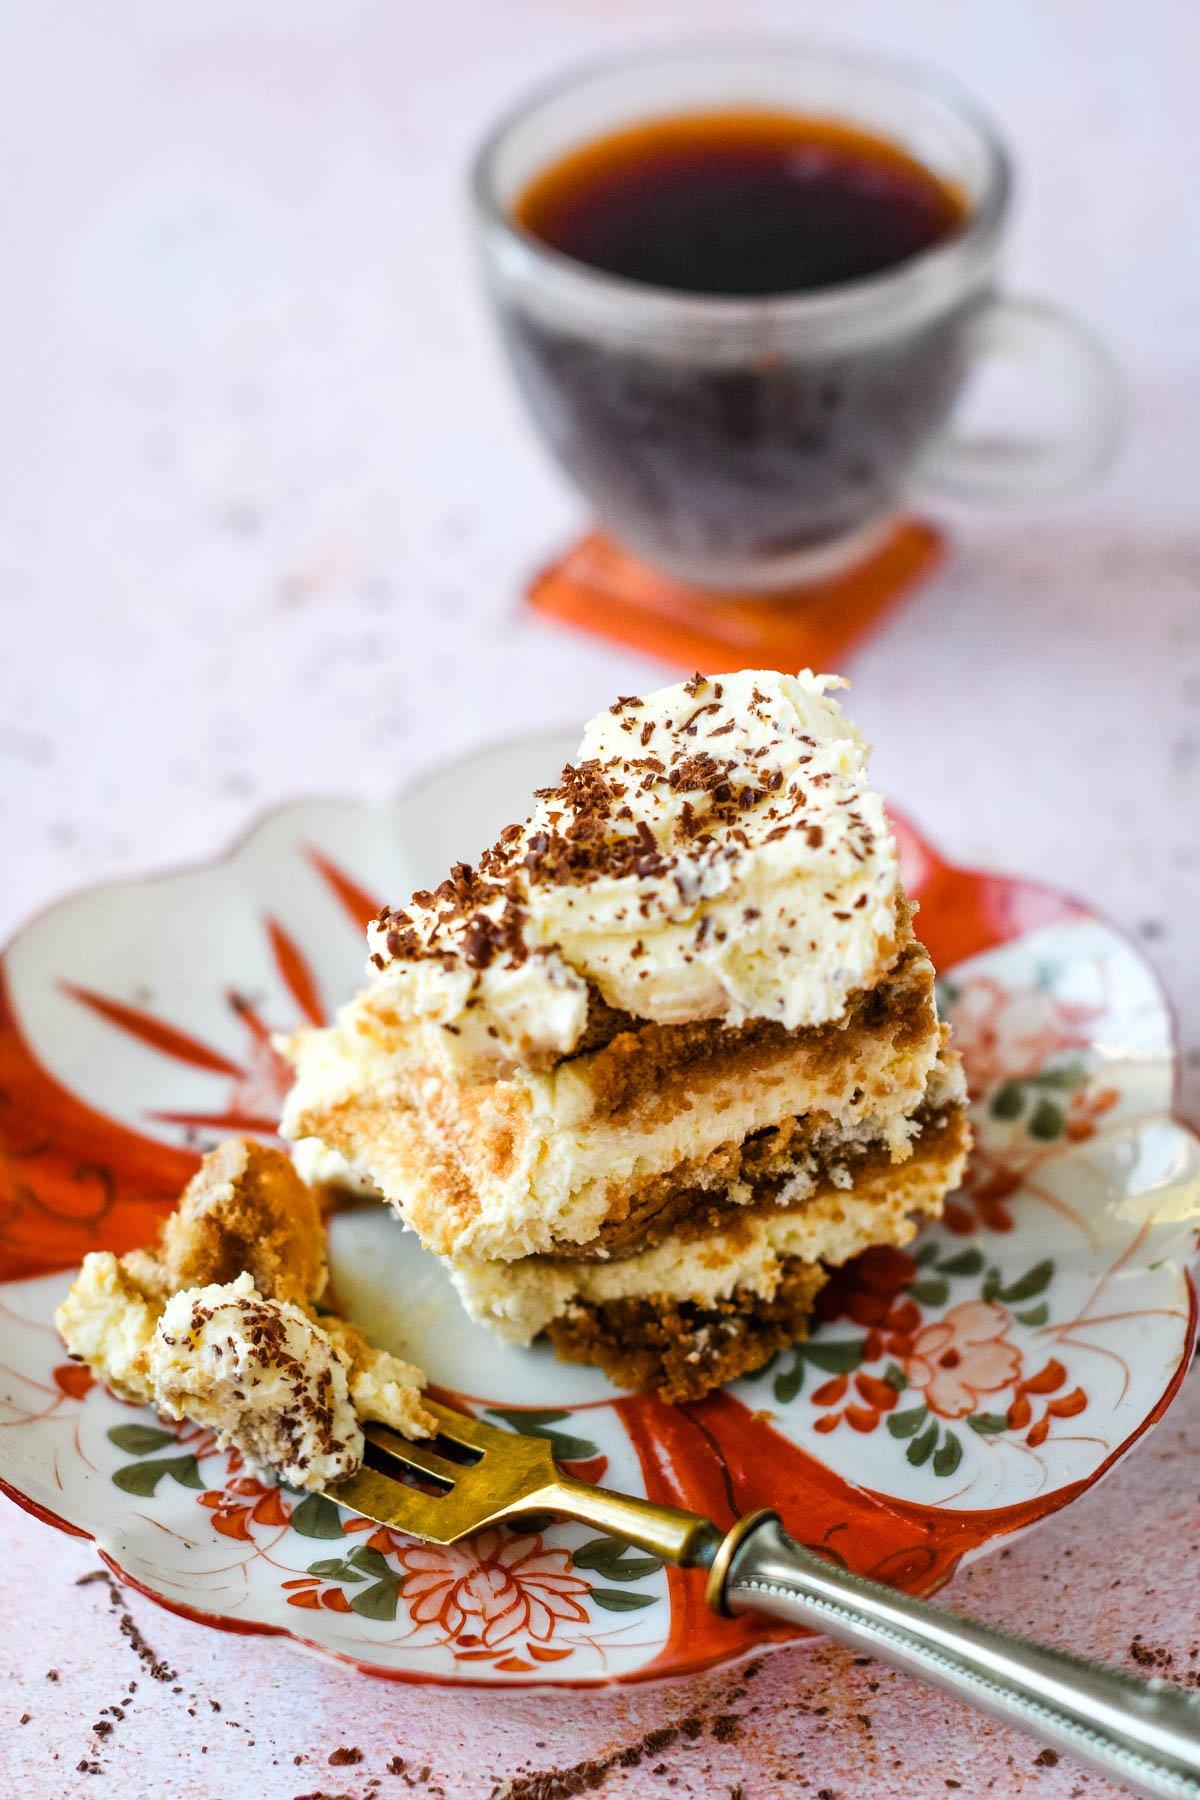 fork in slice of tiramisu with espresso coffee behind